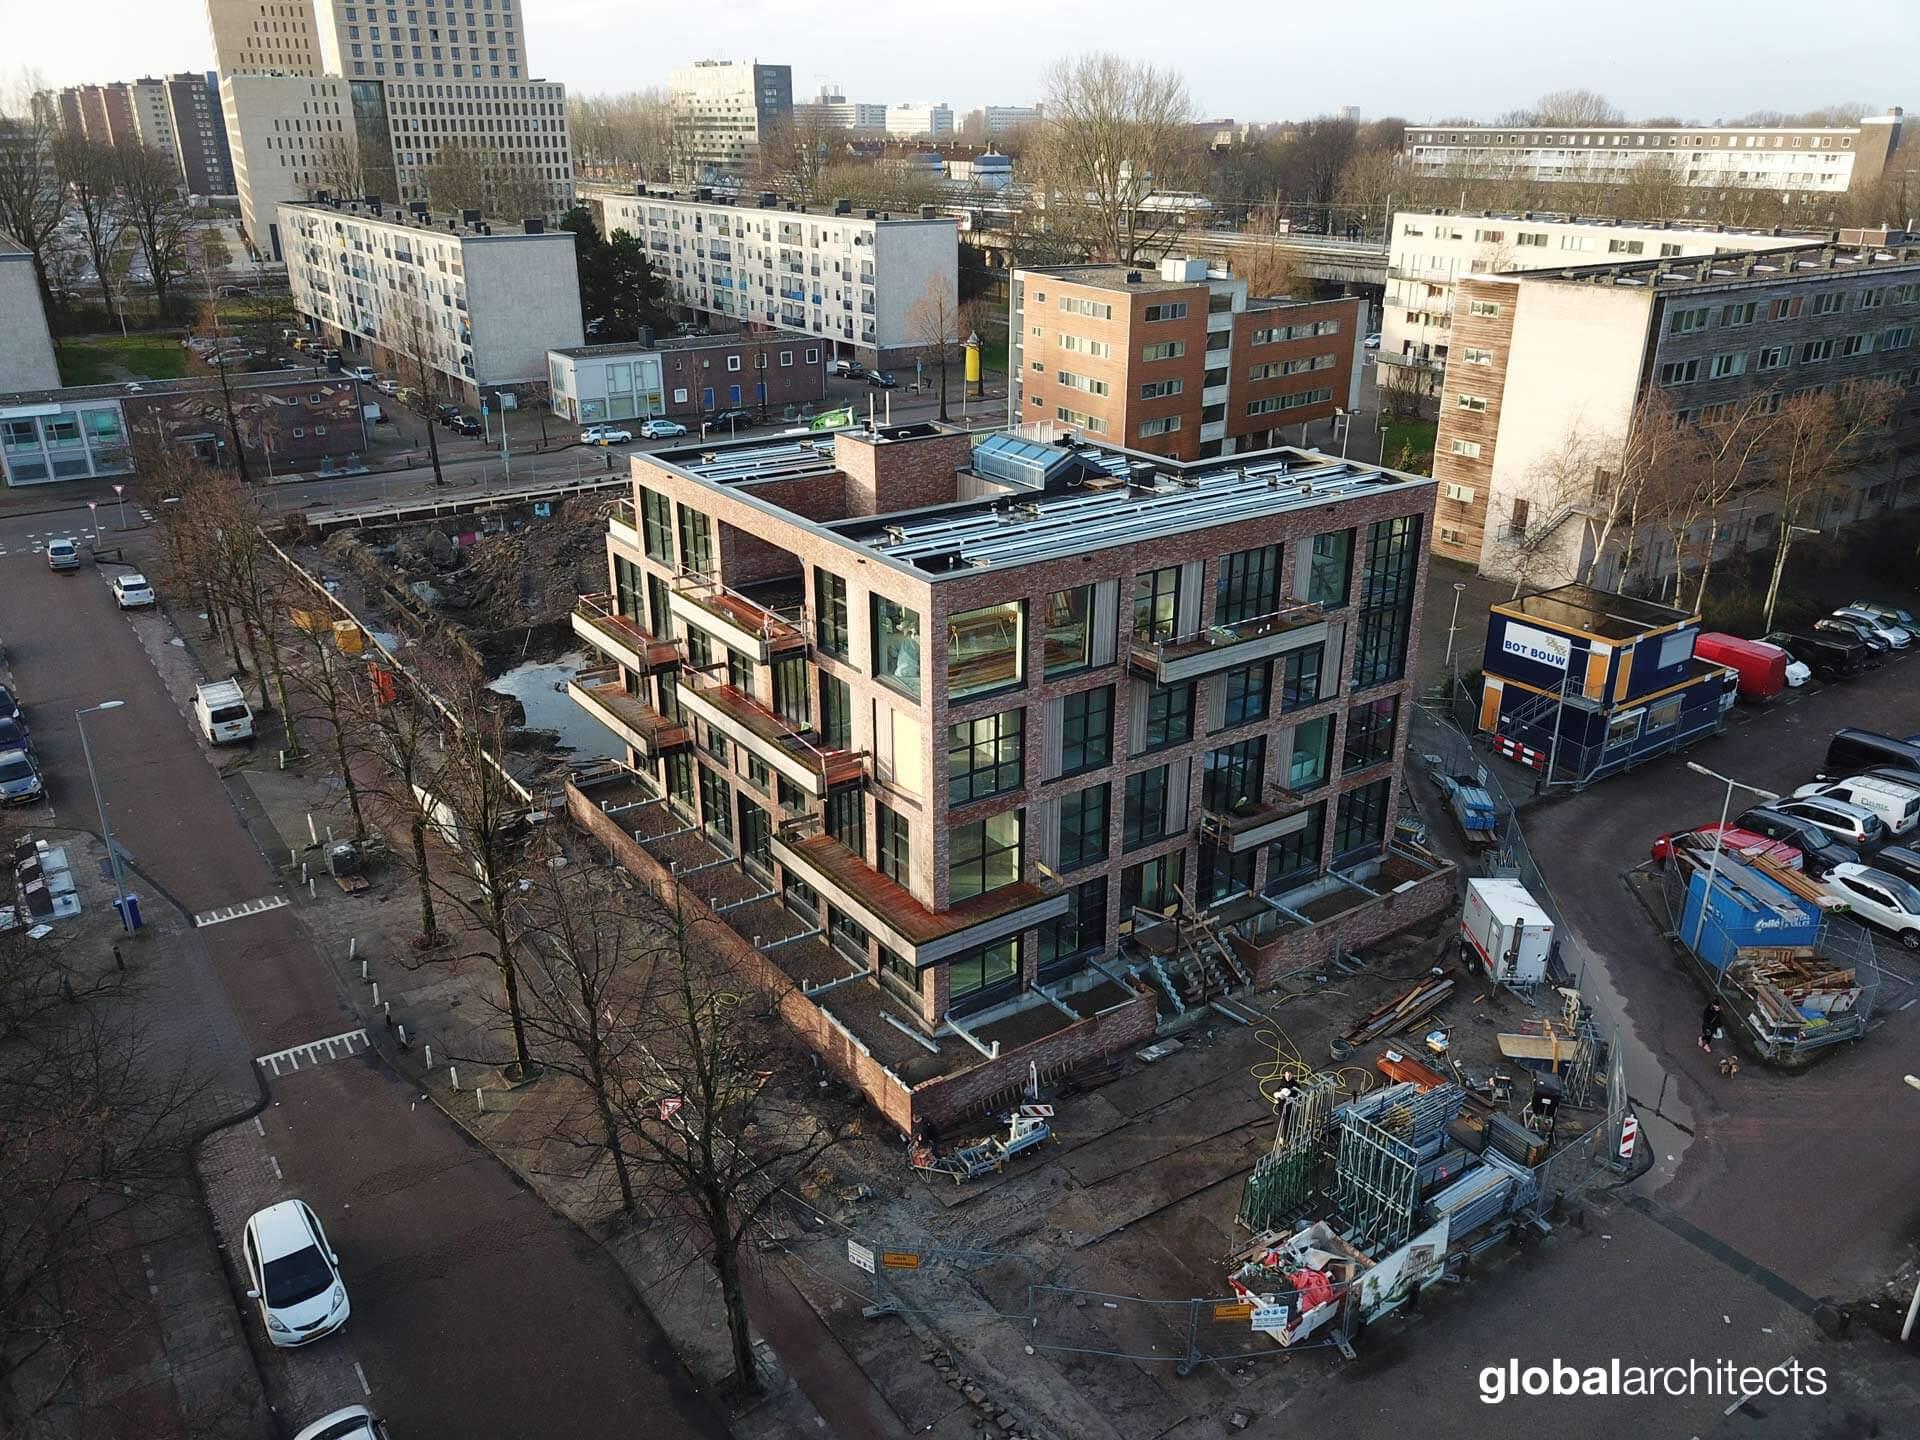 urban_garden_apartementen_cpo_zelfbouw_amsterdam